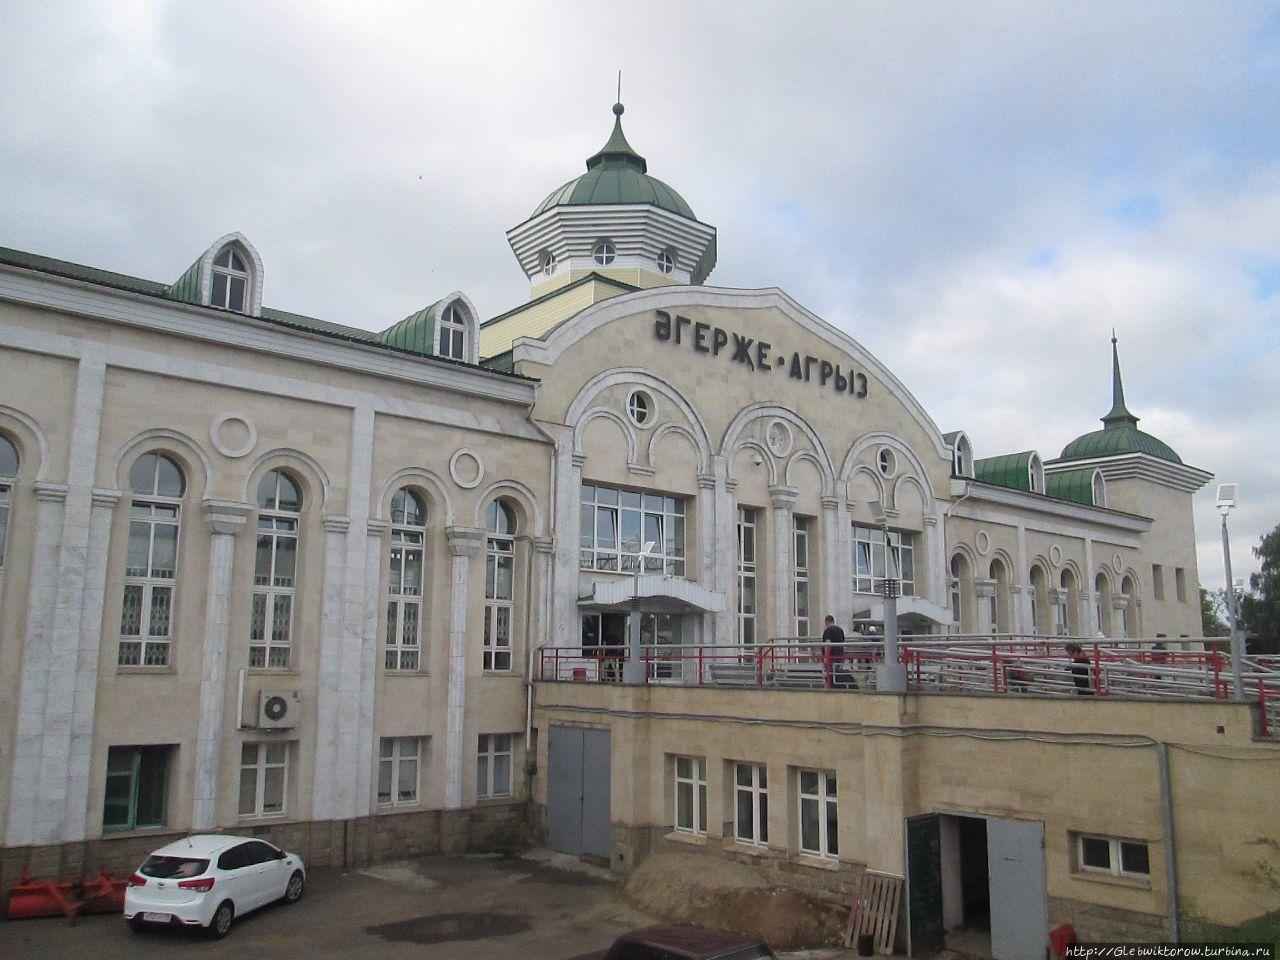 всегда жд станции татарстан фото соучастник правонарушения сказал